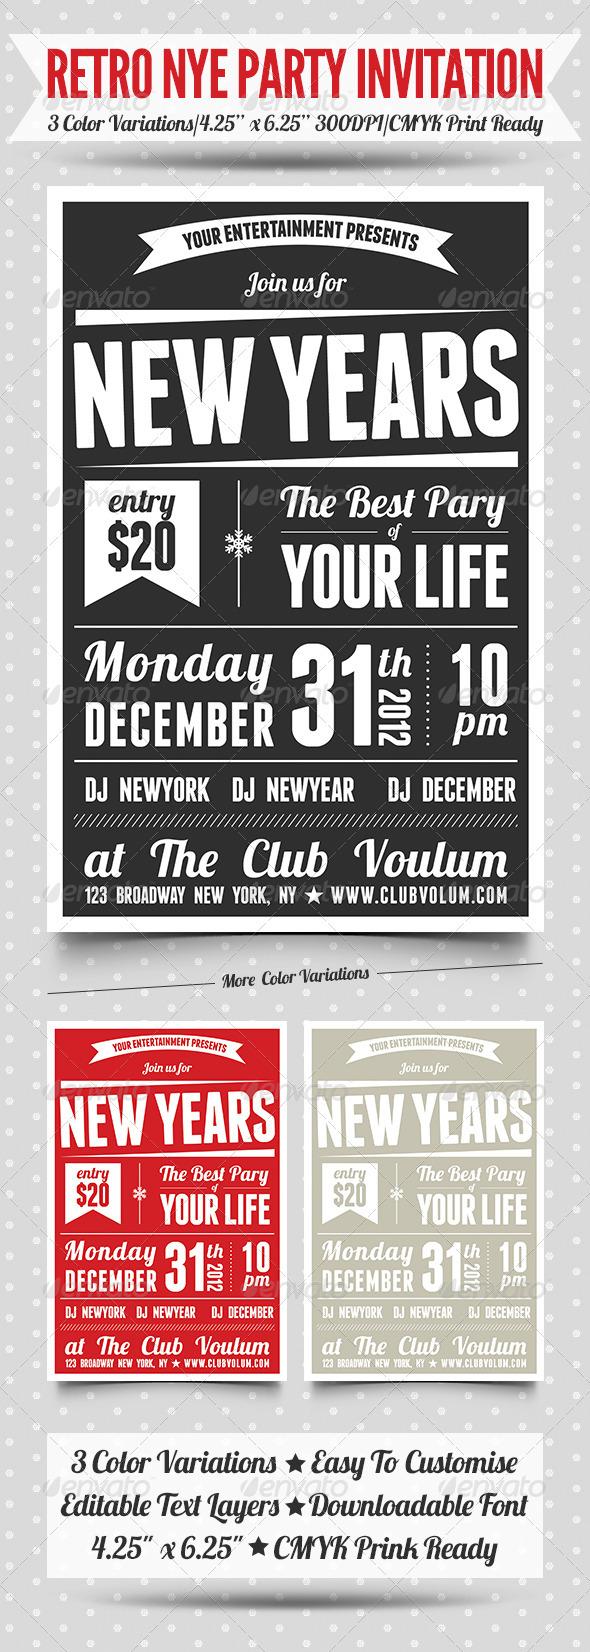 GraphicRiver 2013 Retro New Years Eve Party Invitation 3552557